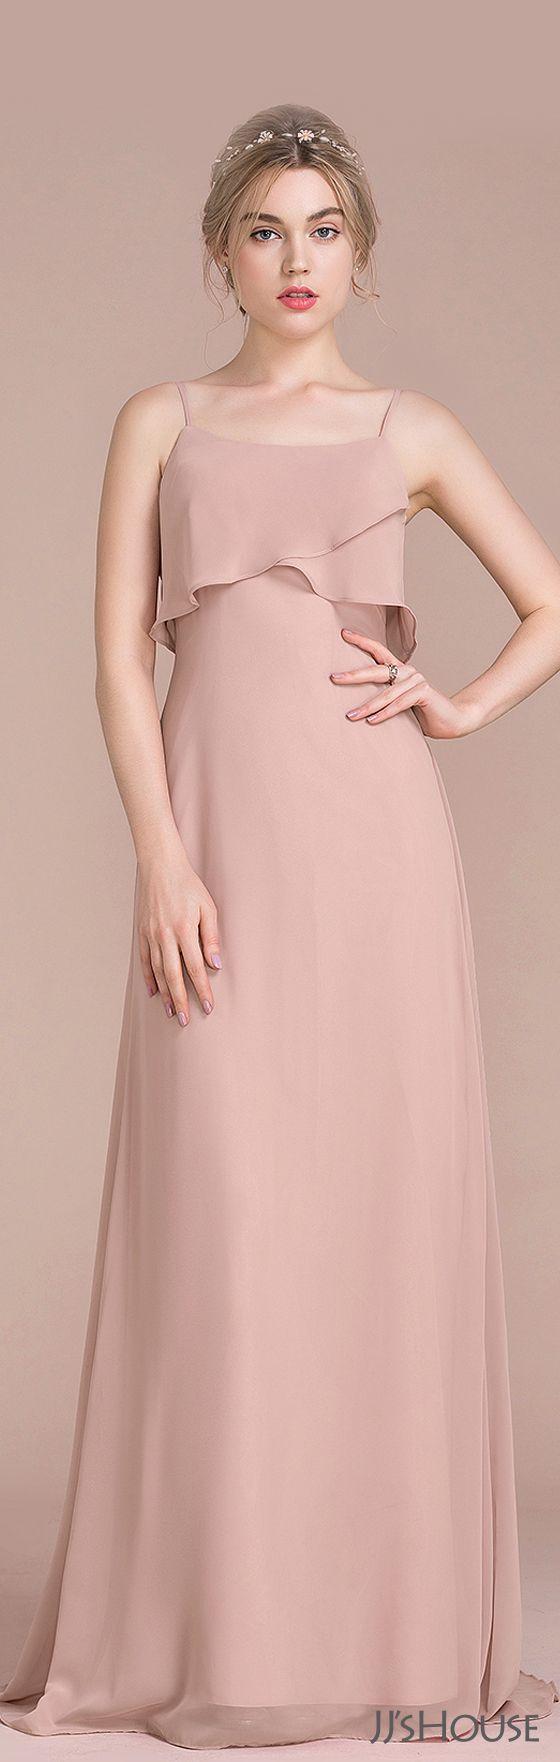 1090 best Vestidos fiesta images on Pinterest | Beautiful gowns ...